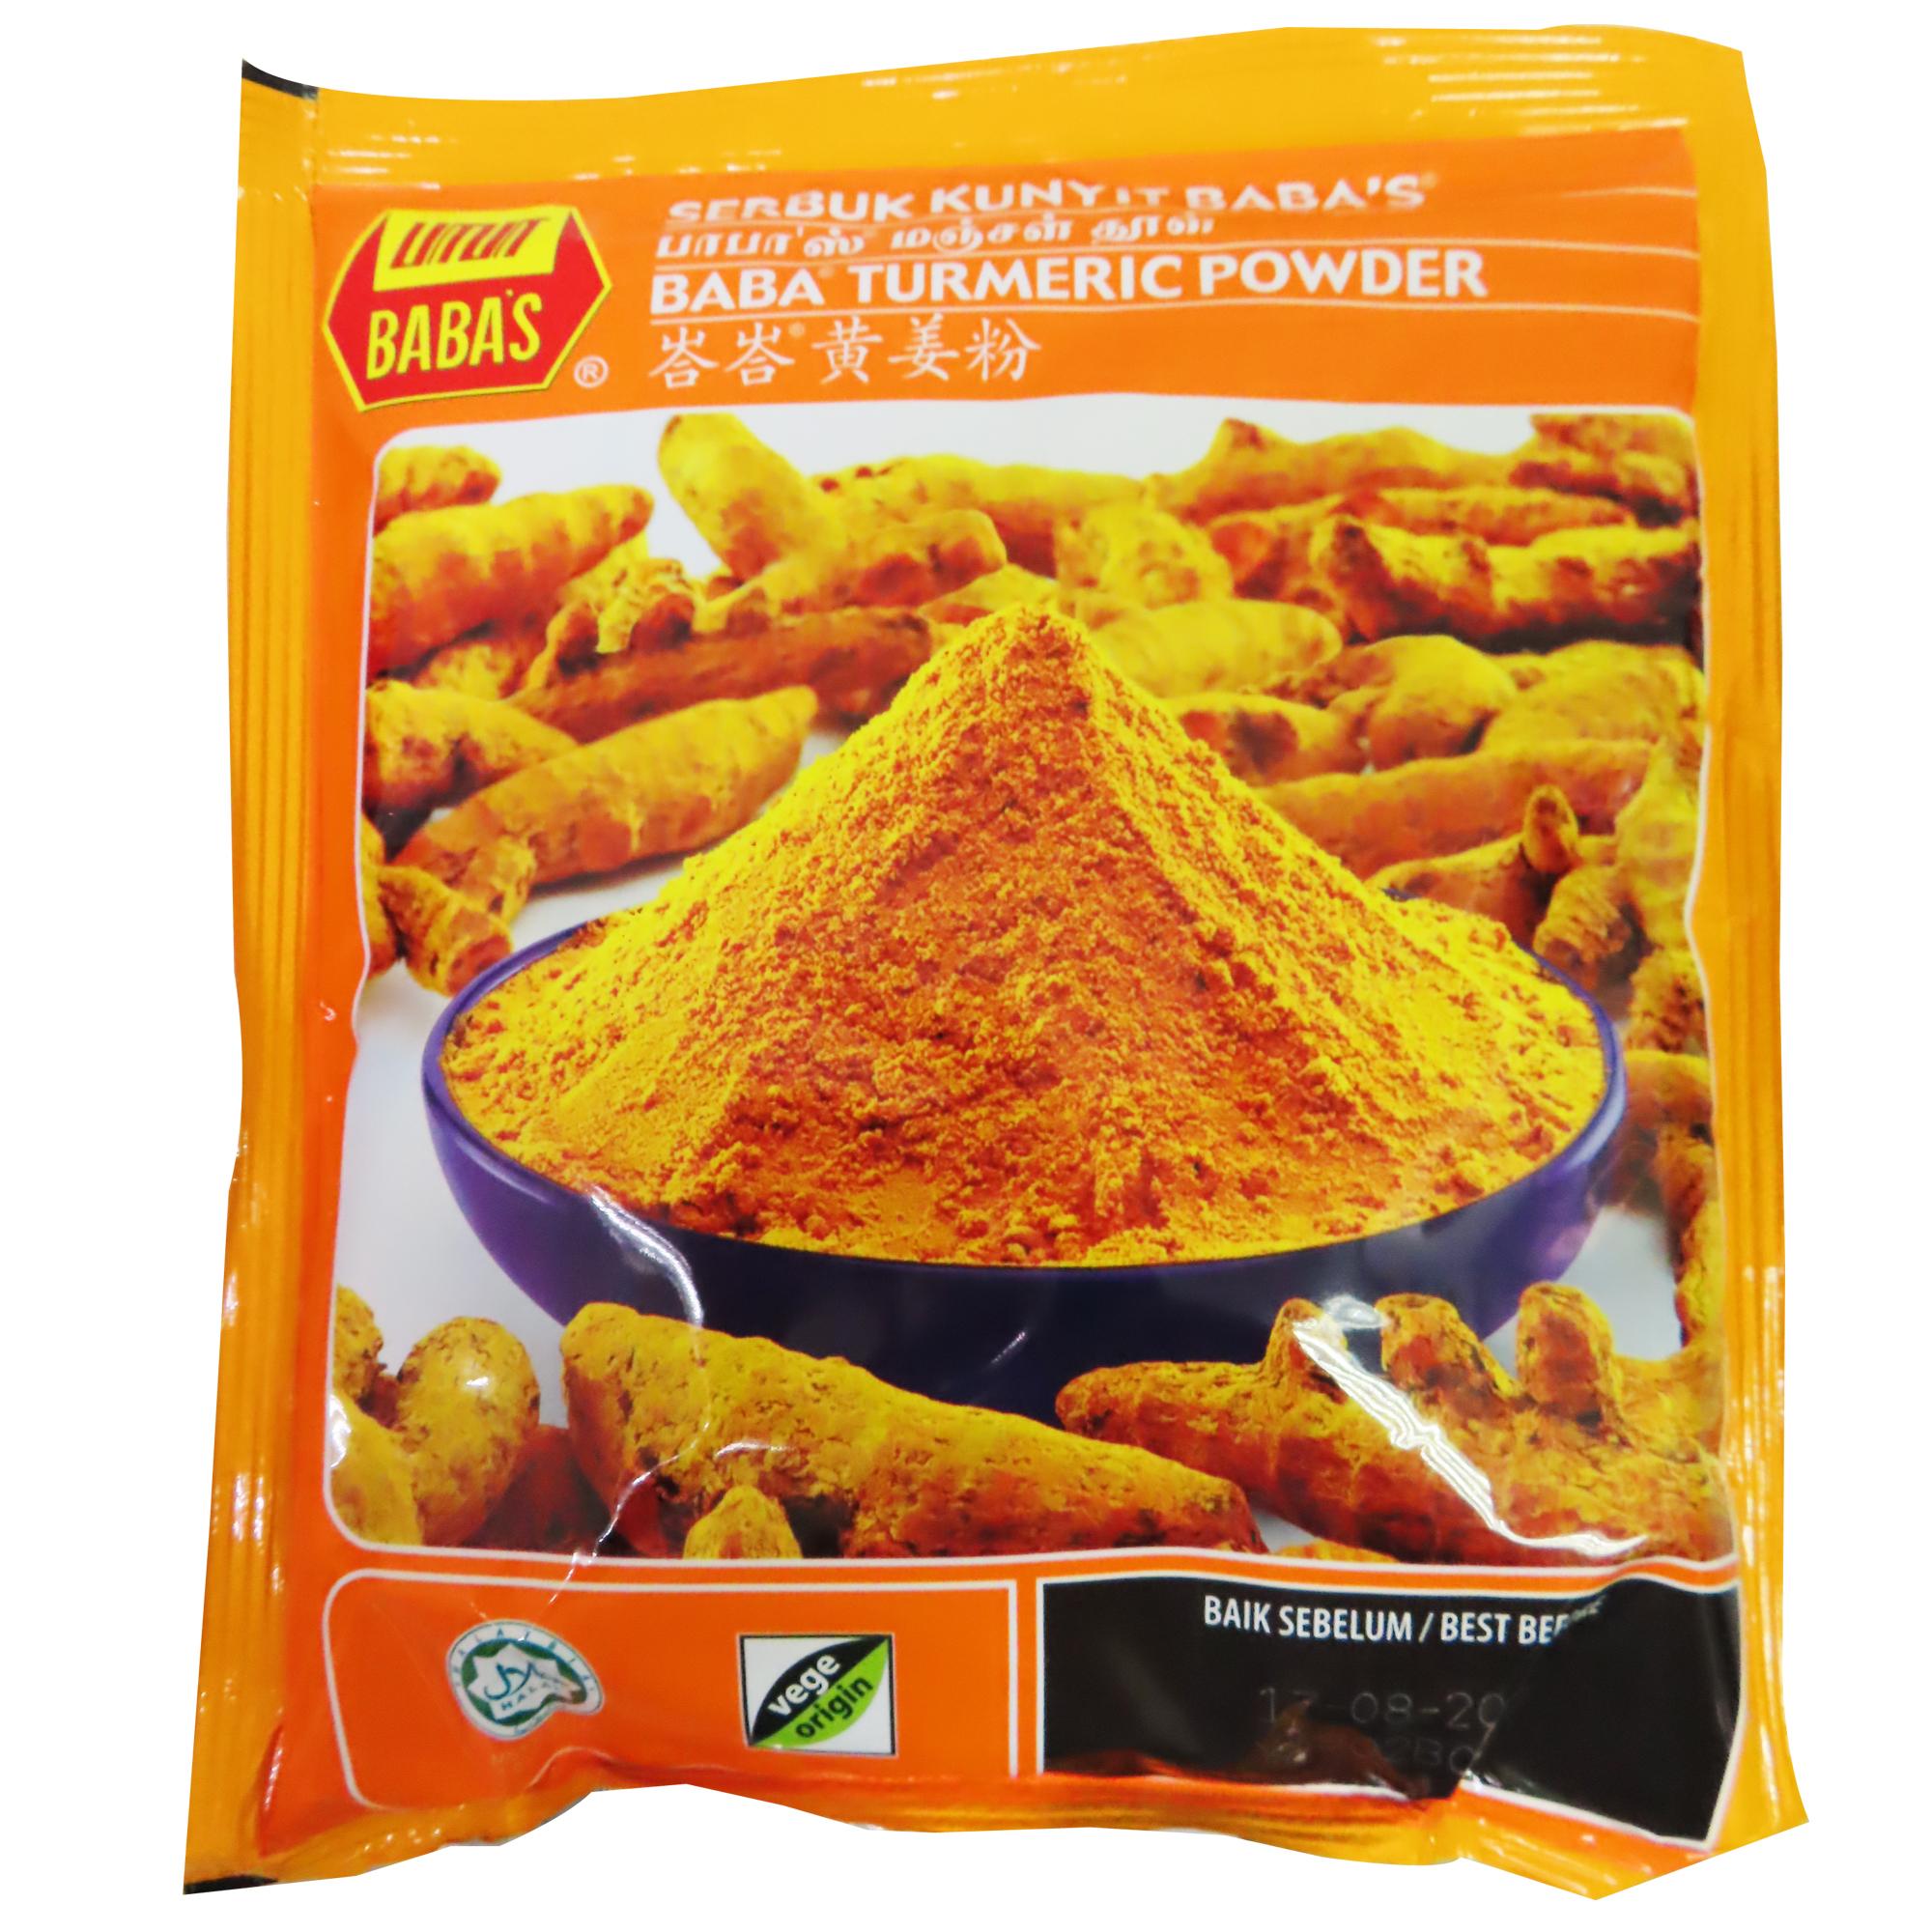 Image Baba Tumeric Powder 250g - 姜黄粉